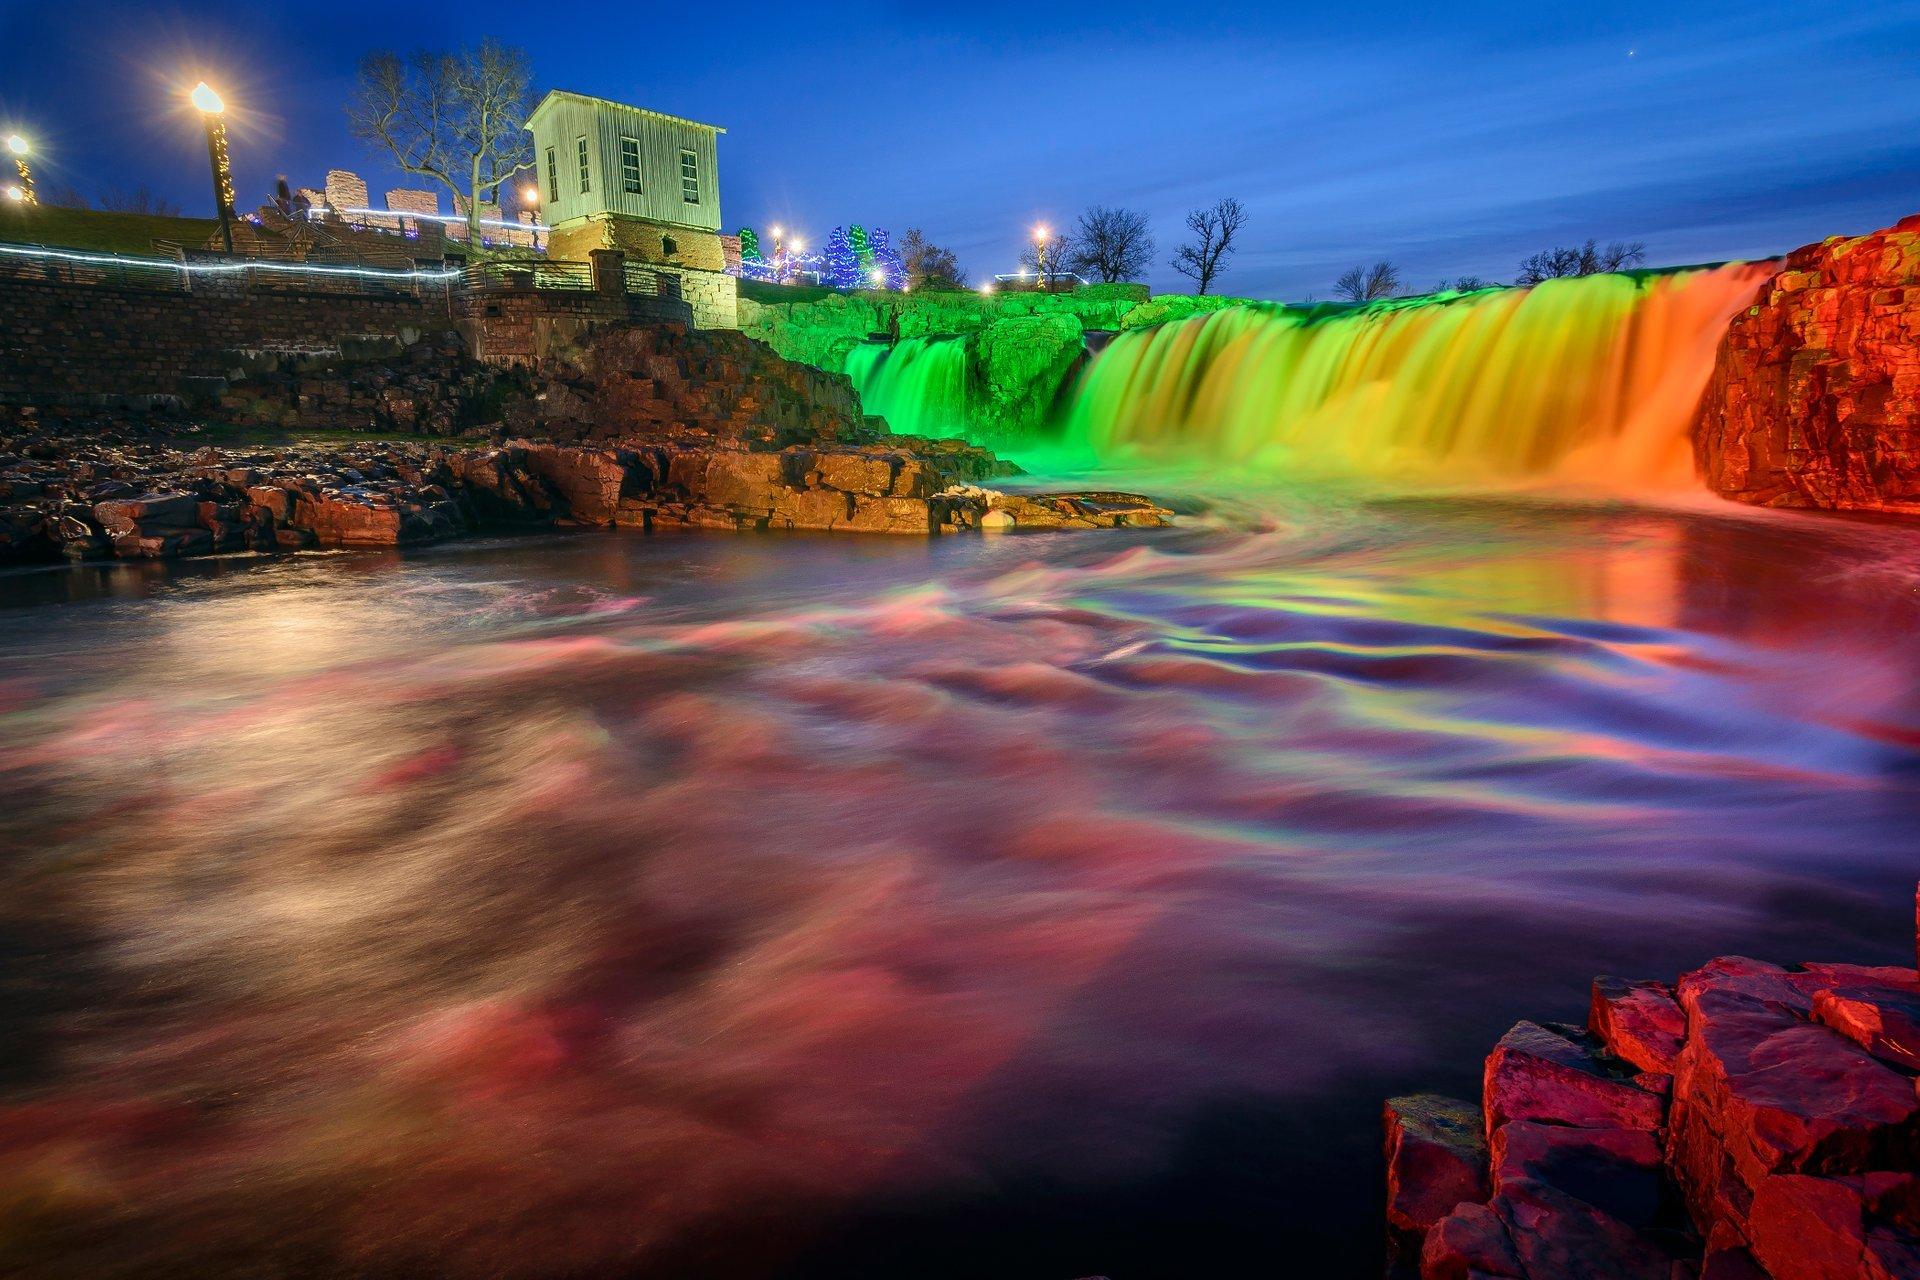 Winter Wonderland at Falls Park 2020-2021 in South Dakota - Dates & Map